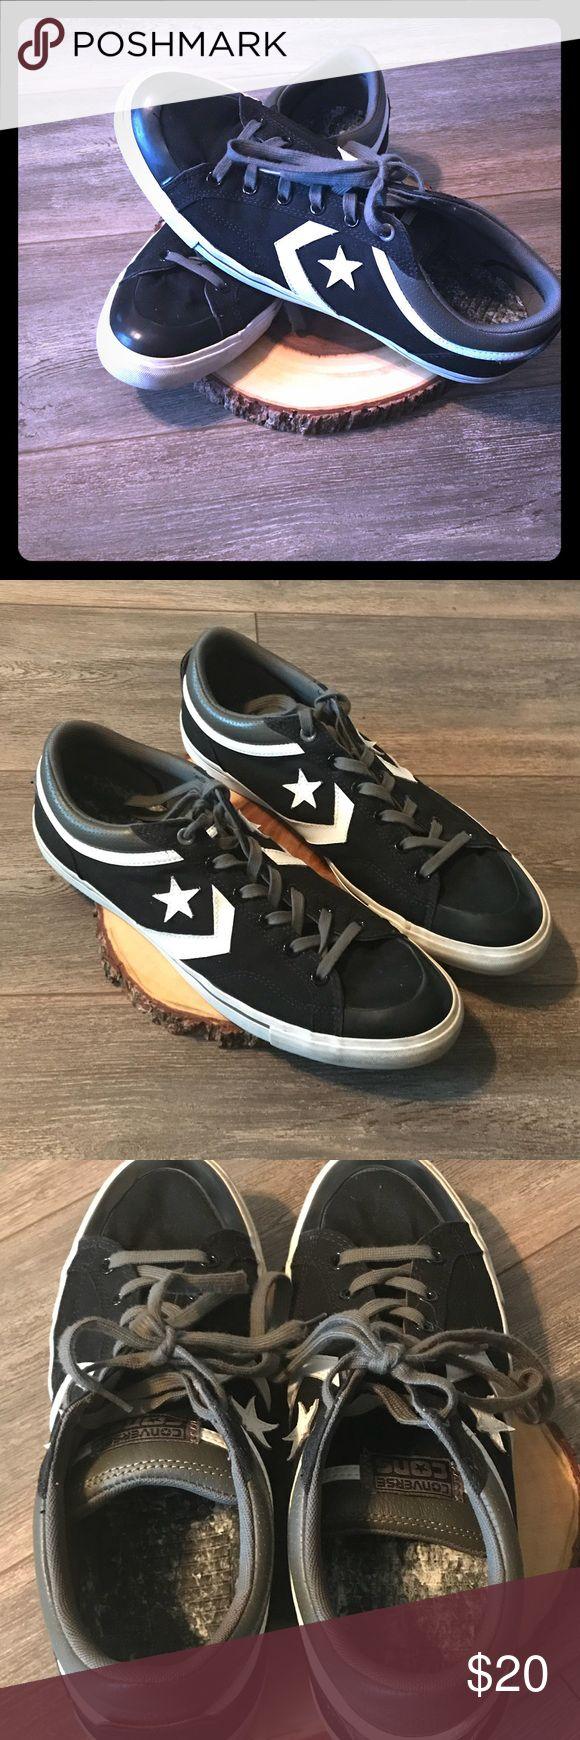 Converse men's shoes Black and white Converses men's shoes size 13 Shoes Sneakers